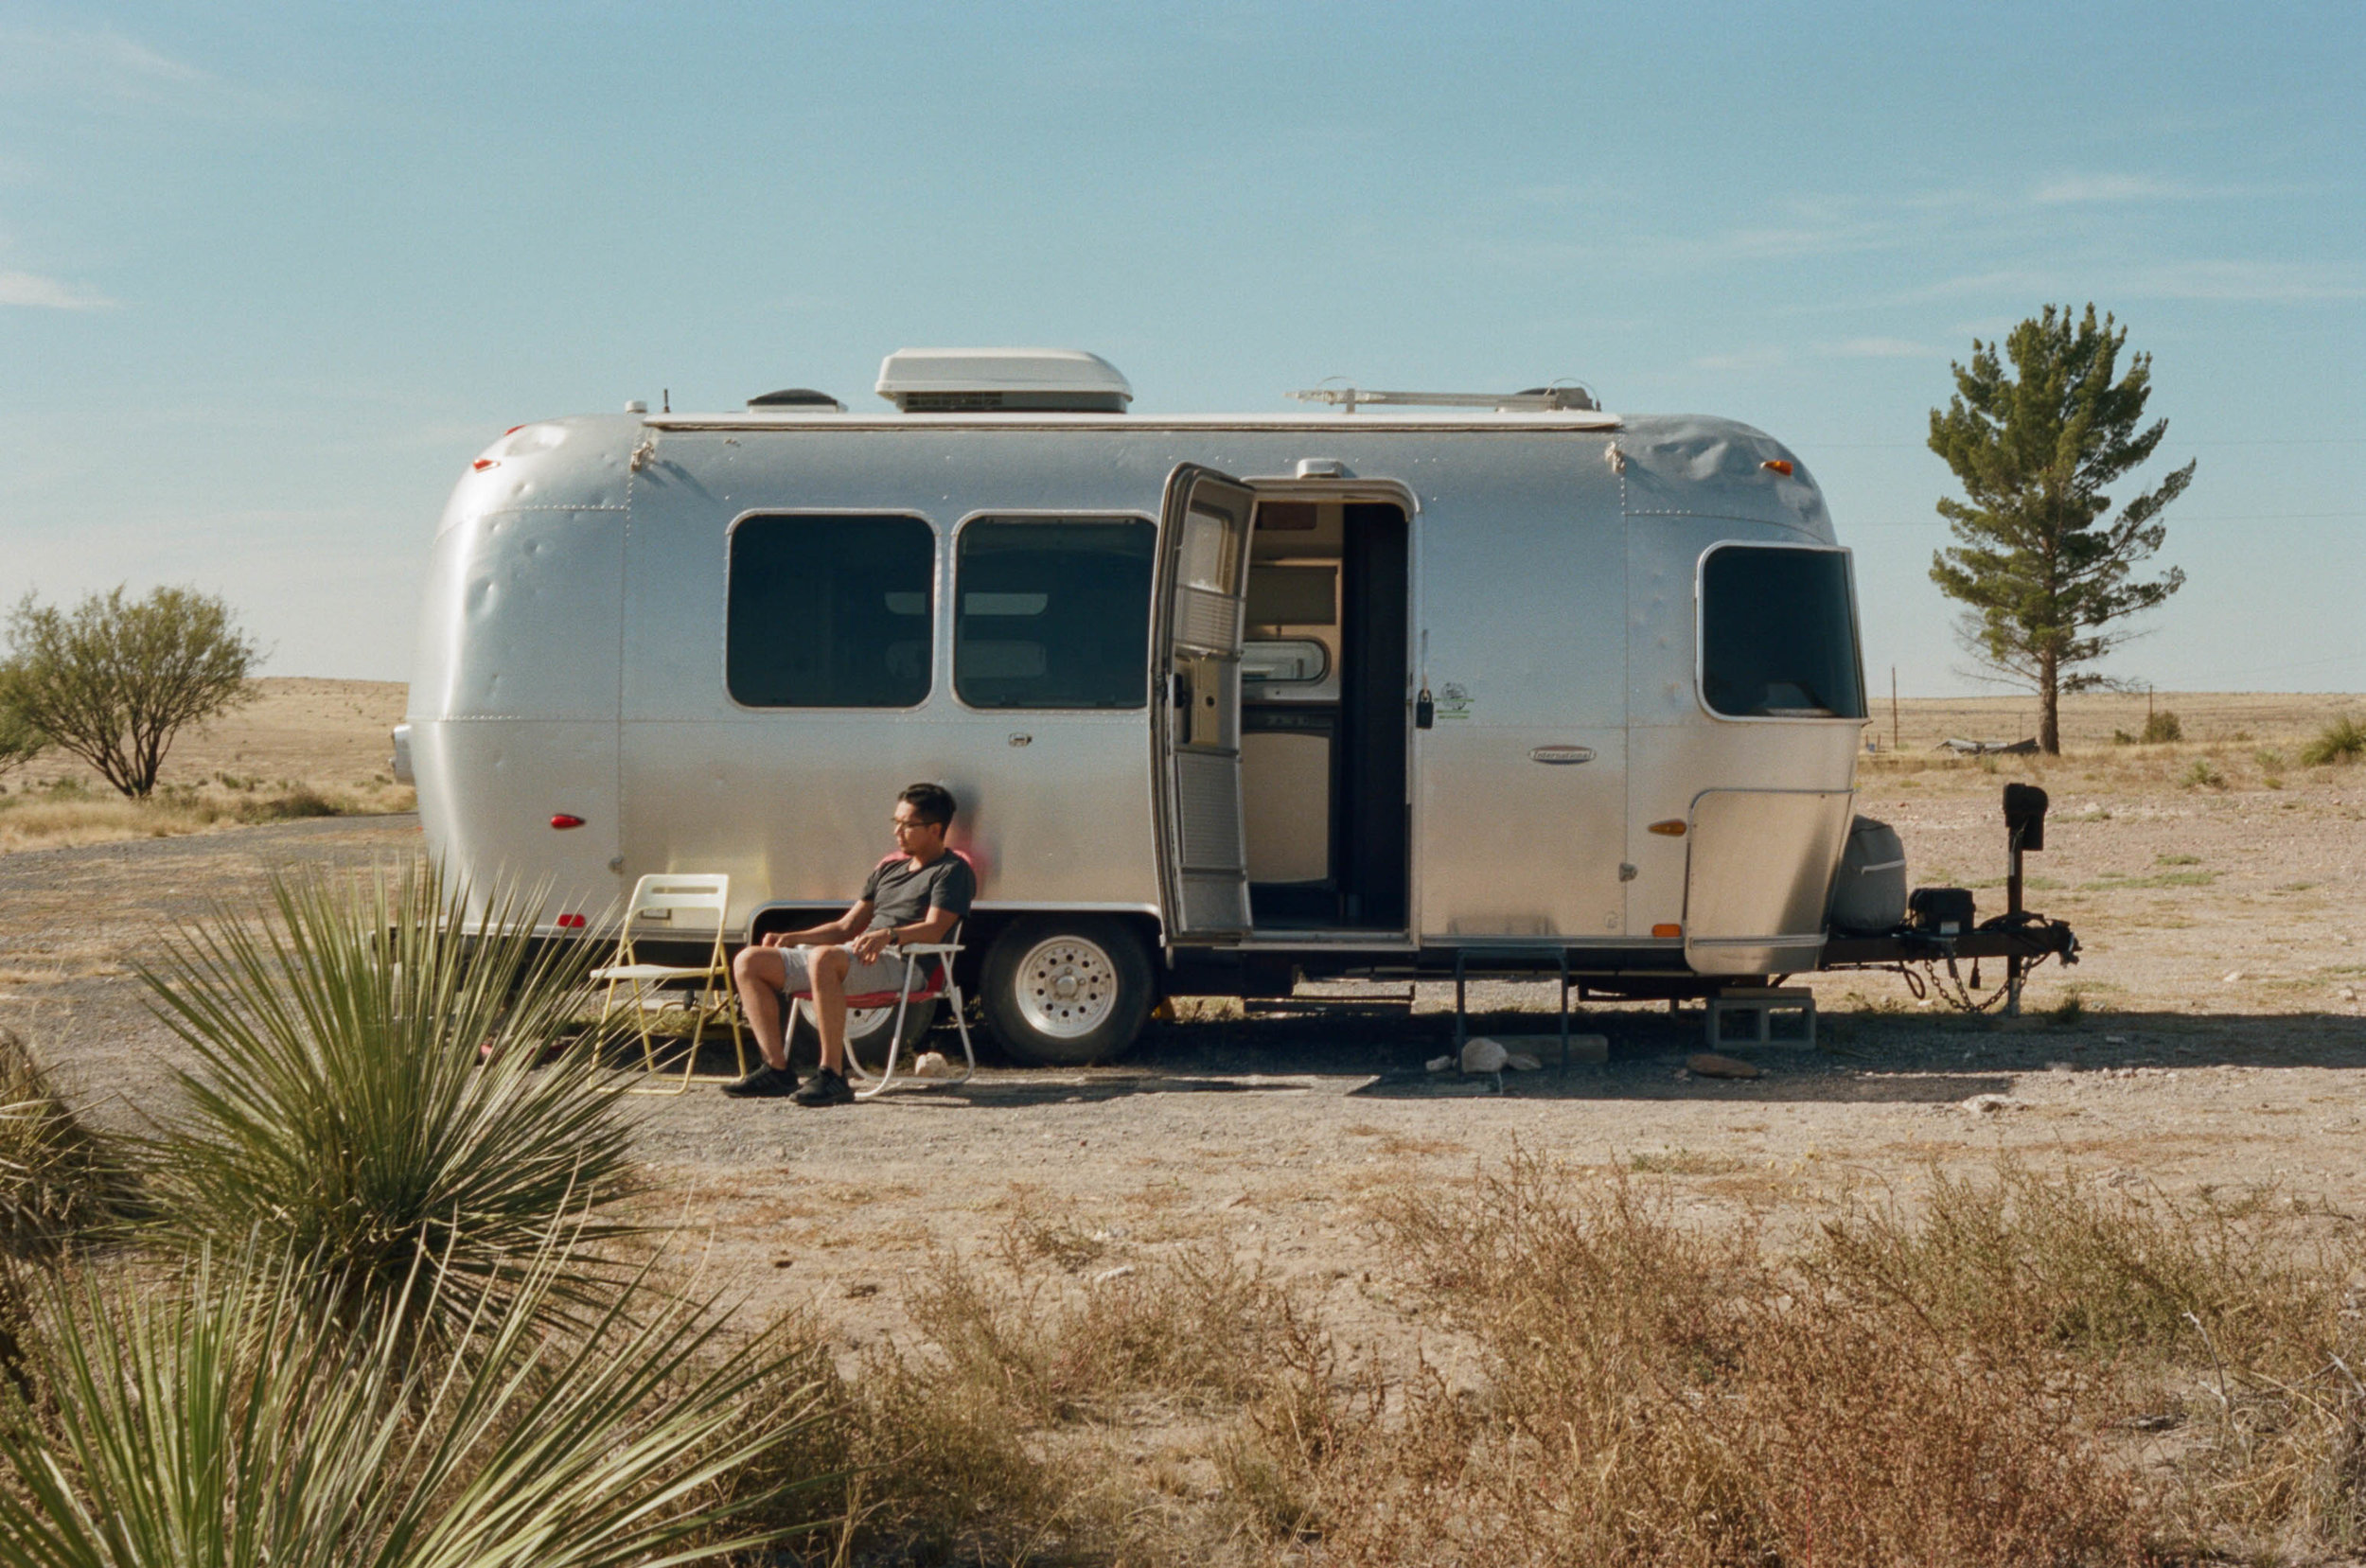 road-trip-marfa-texas-anderson-airstream-airbnb-portra-160-1